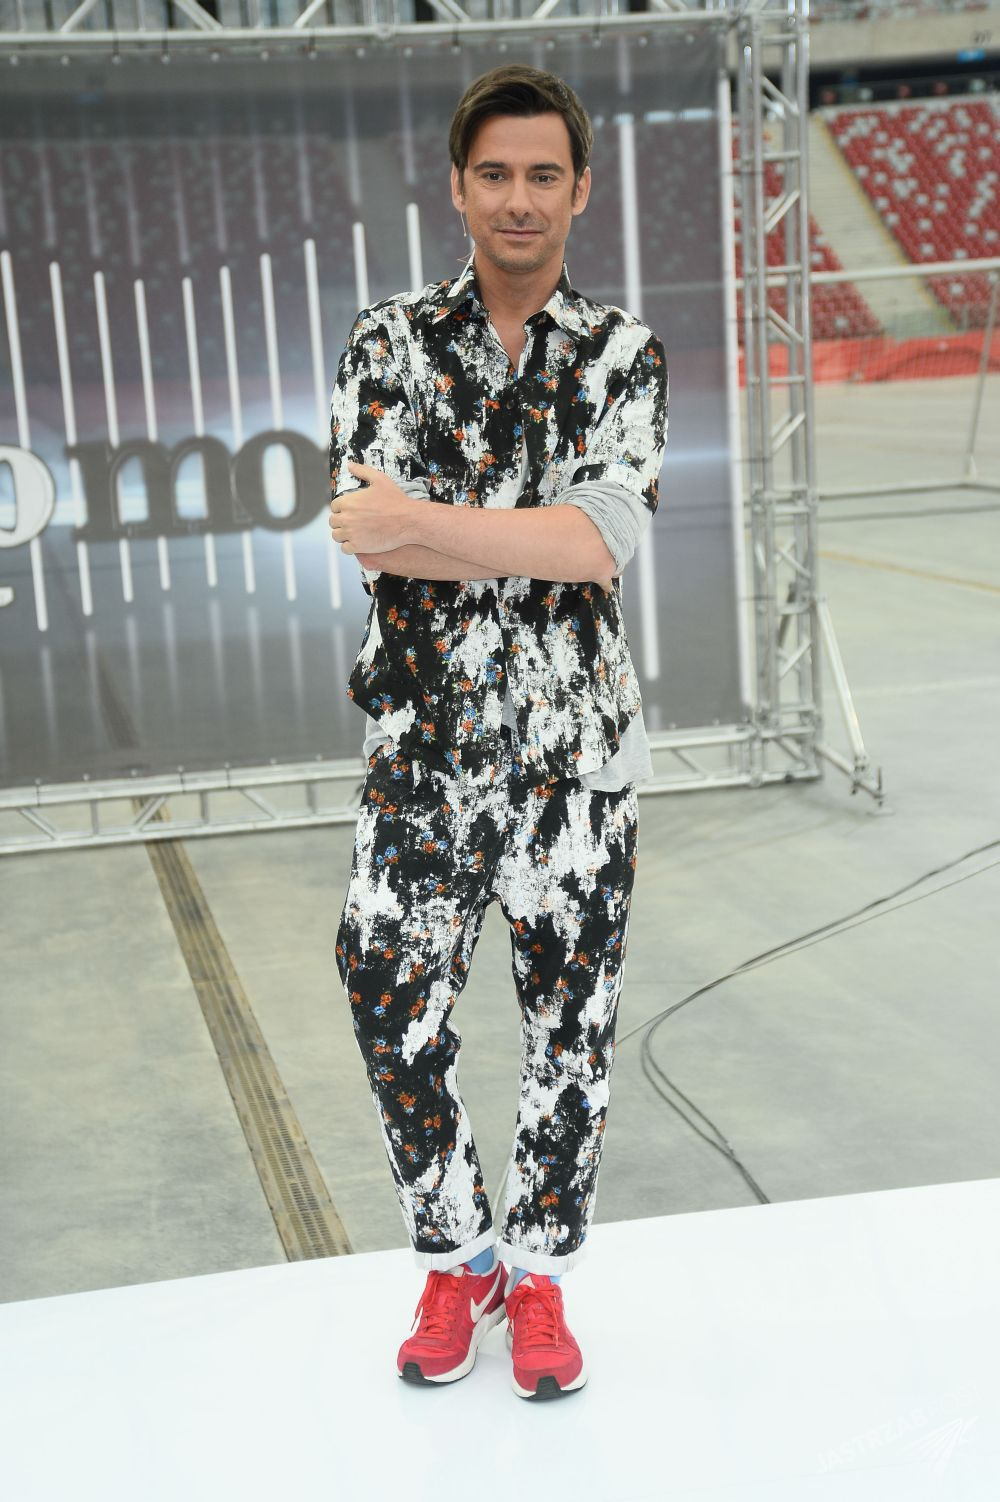 Marcin Tyszka, casting